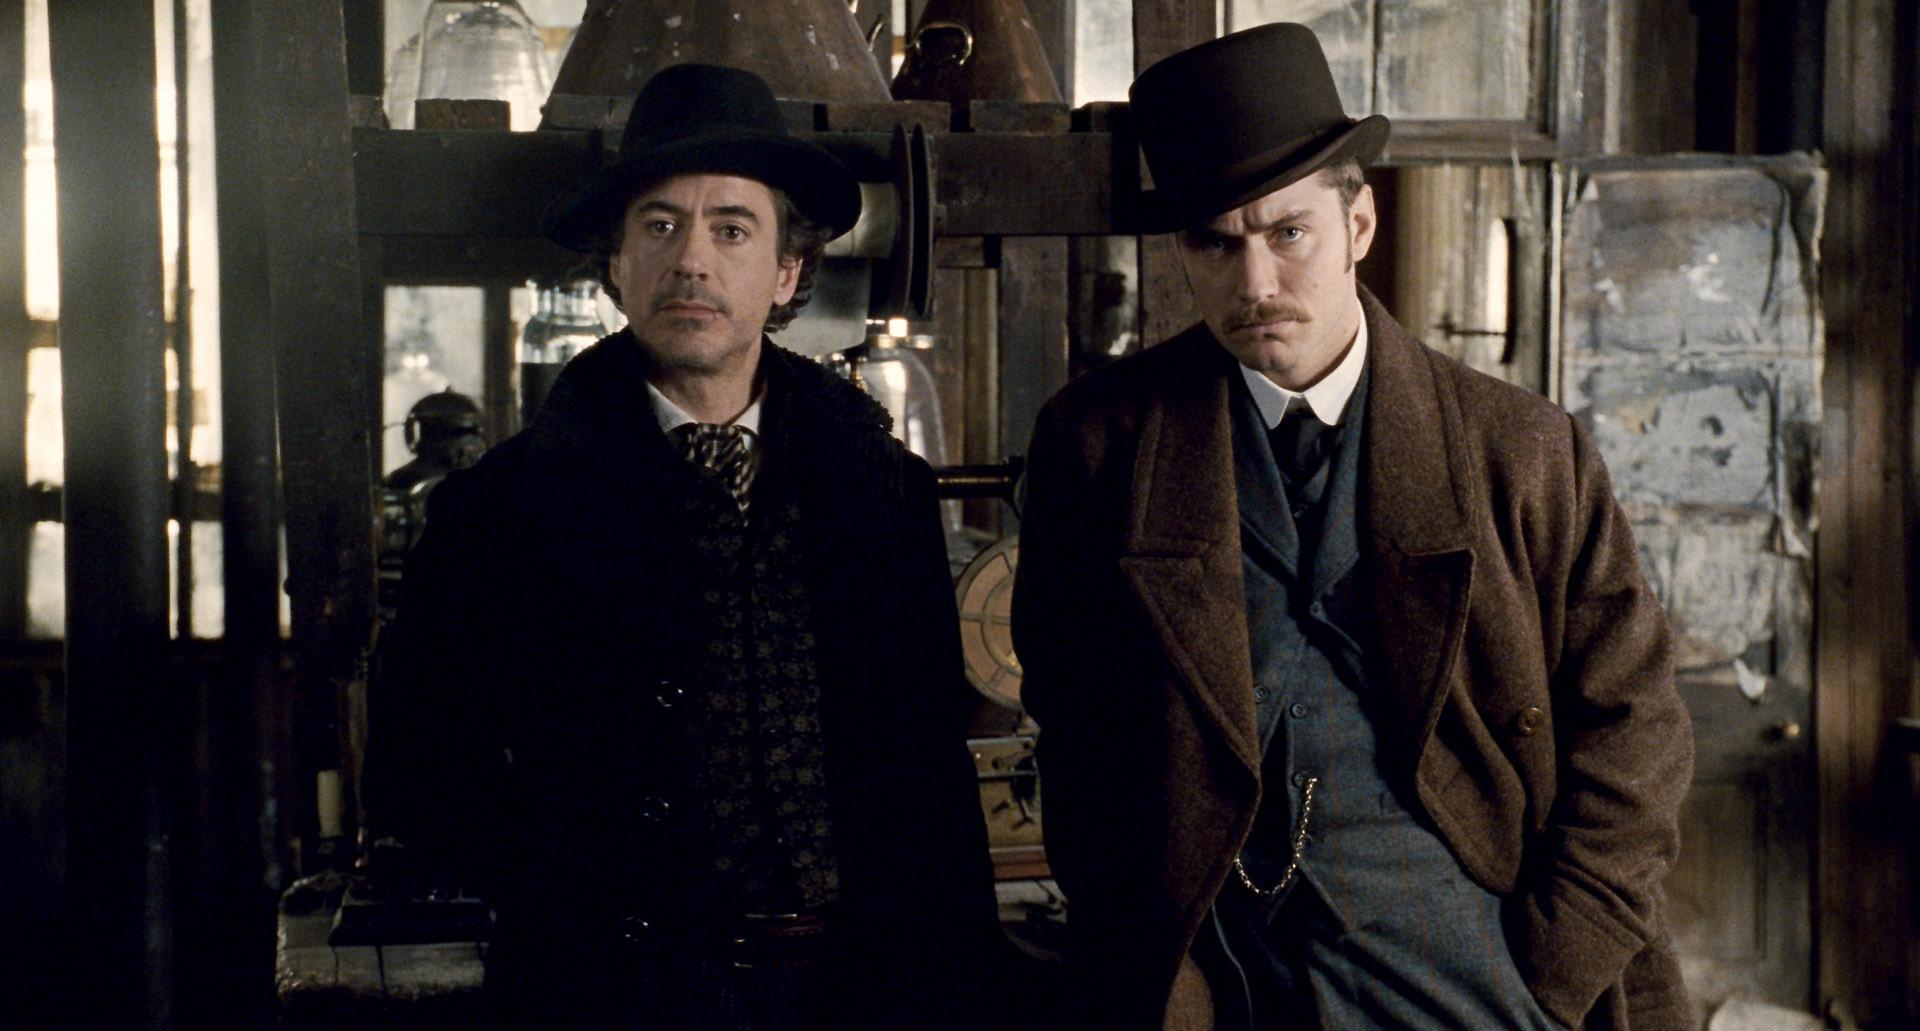 'Sherlock Holmes'   Warner Bros.